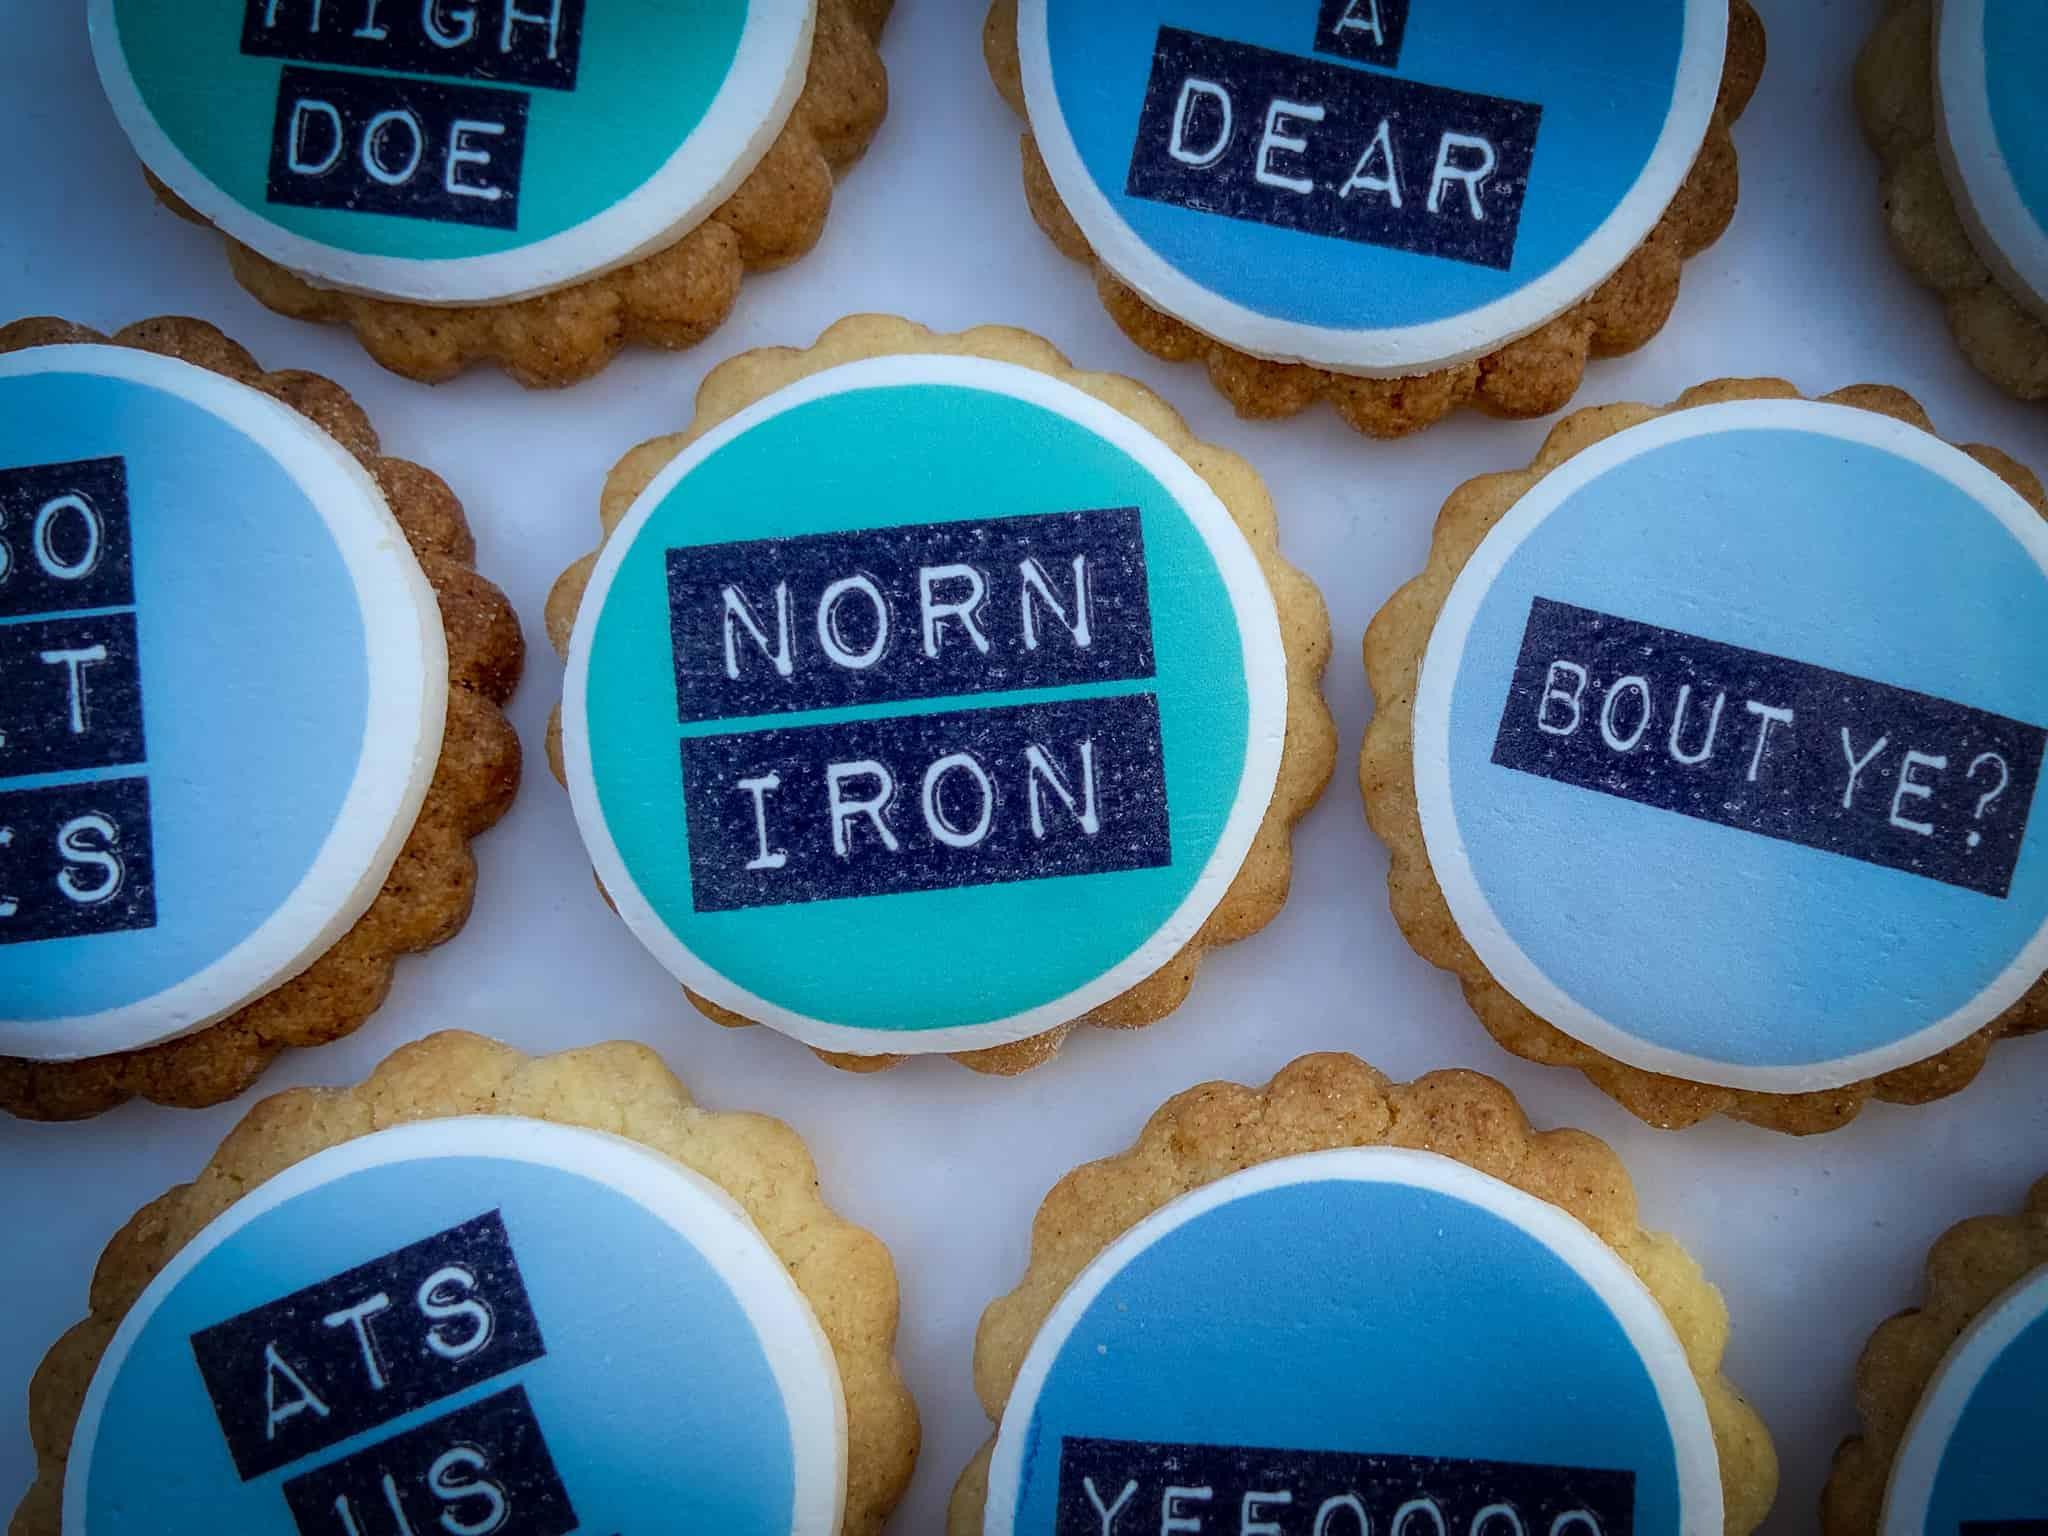 Norn Iron Biscuits (Northern Ireland)